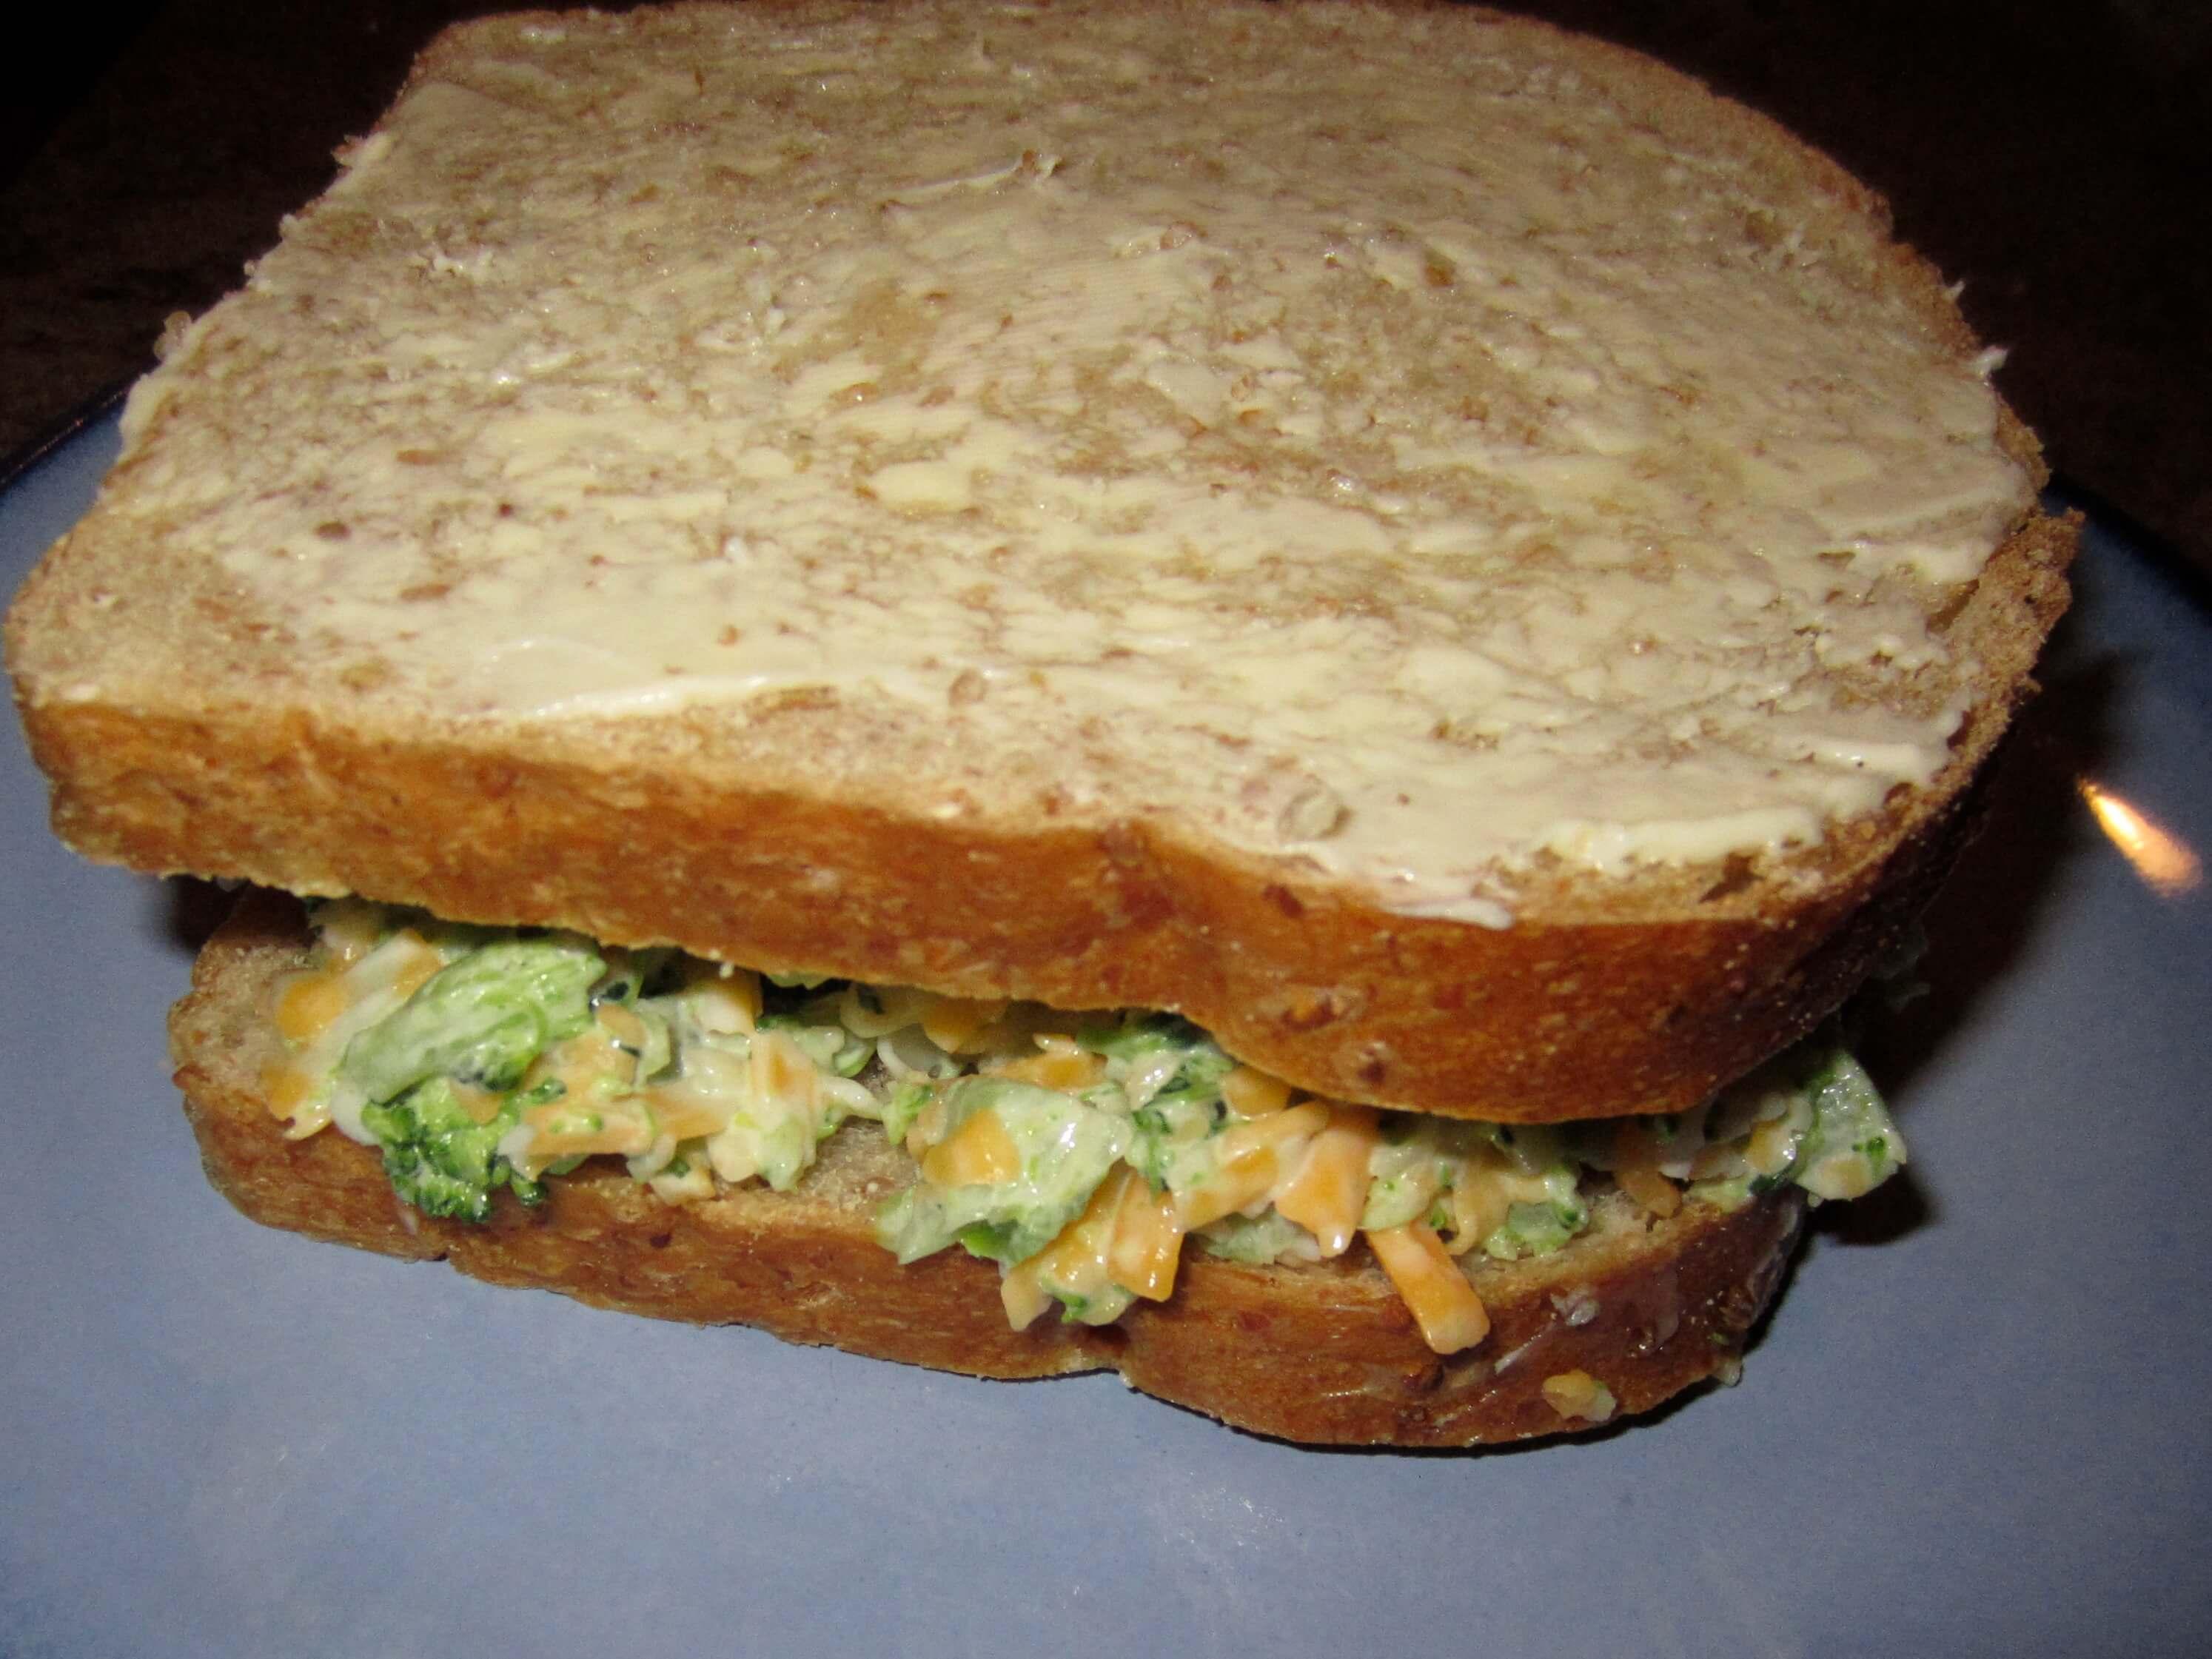 Broccoli cheese sandwich